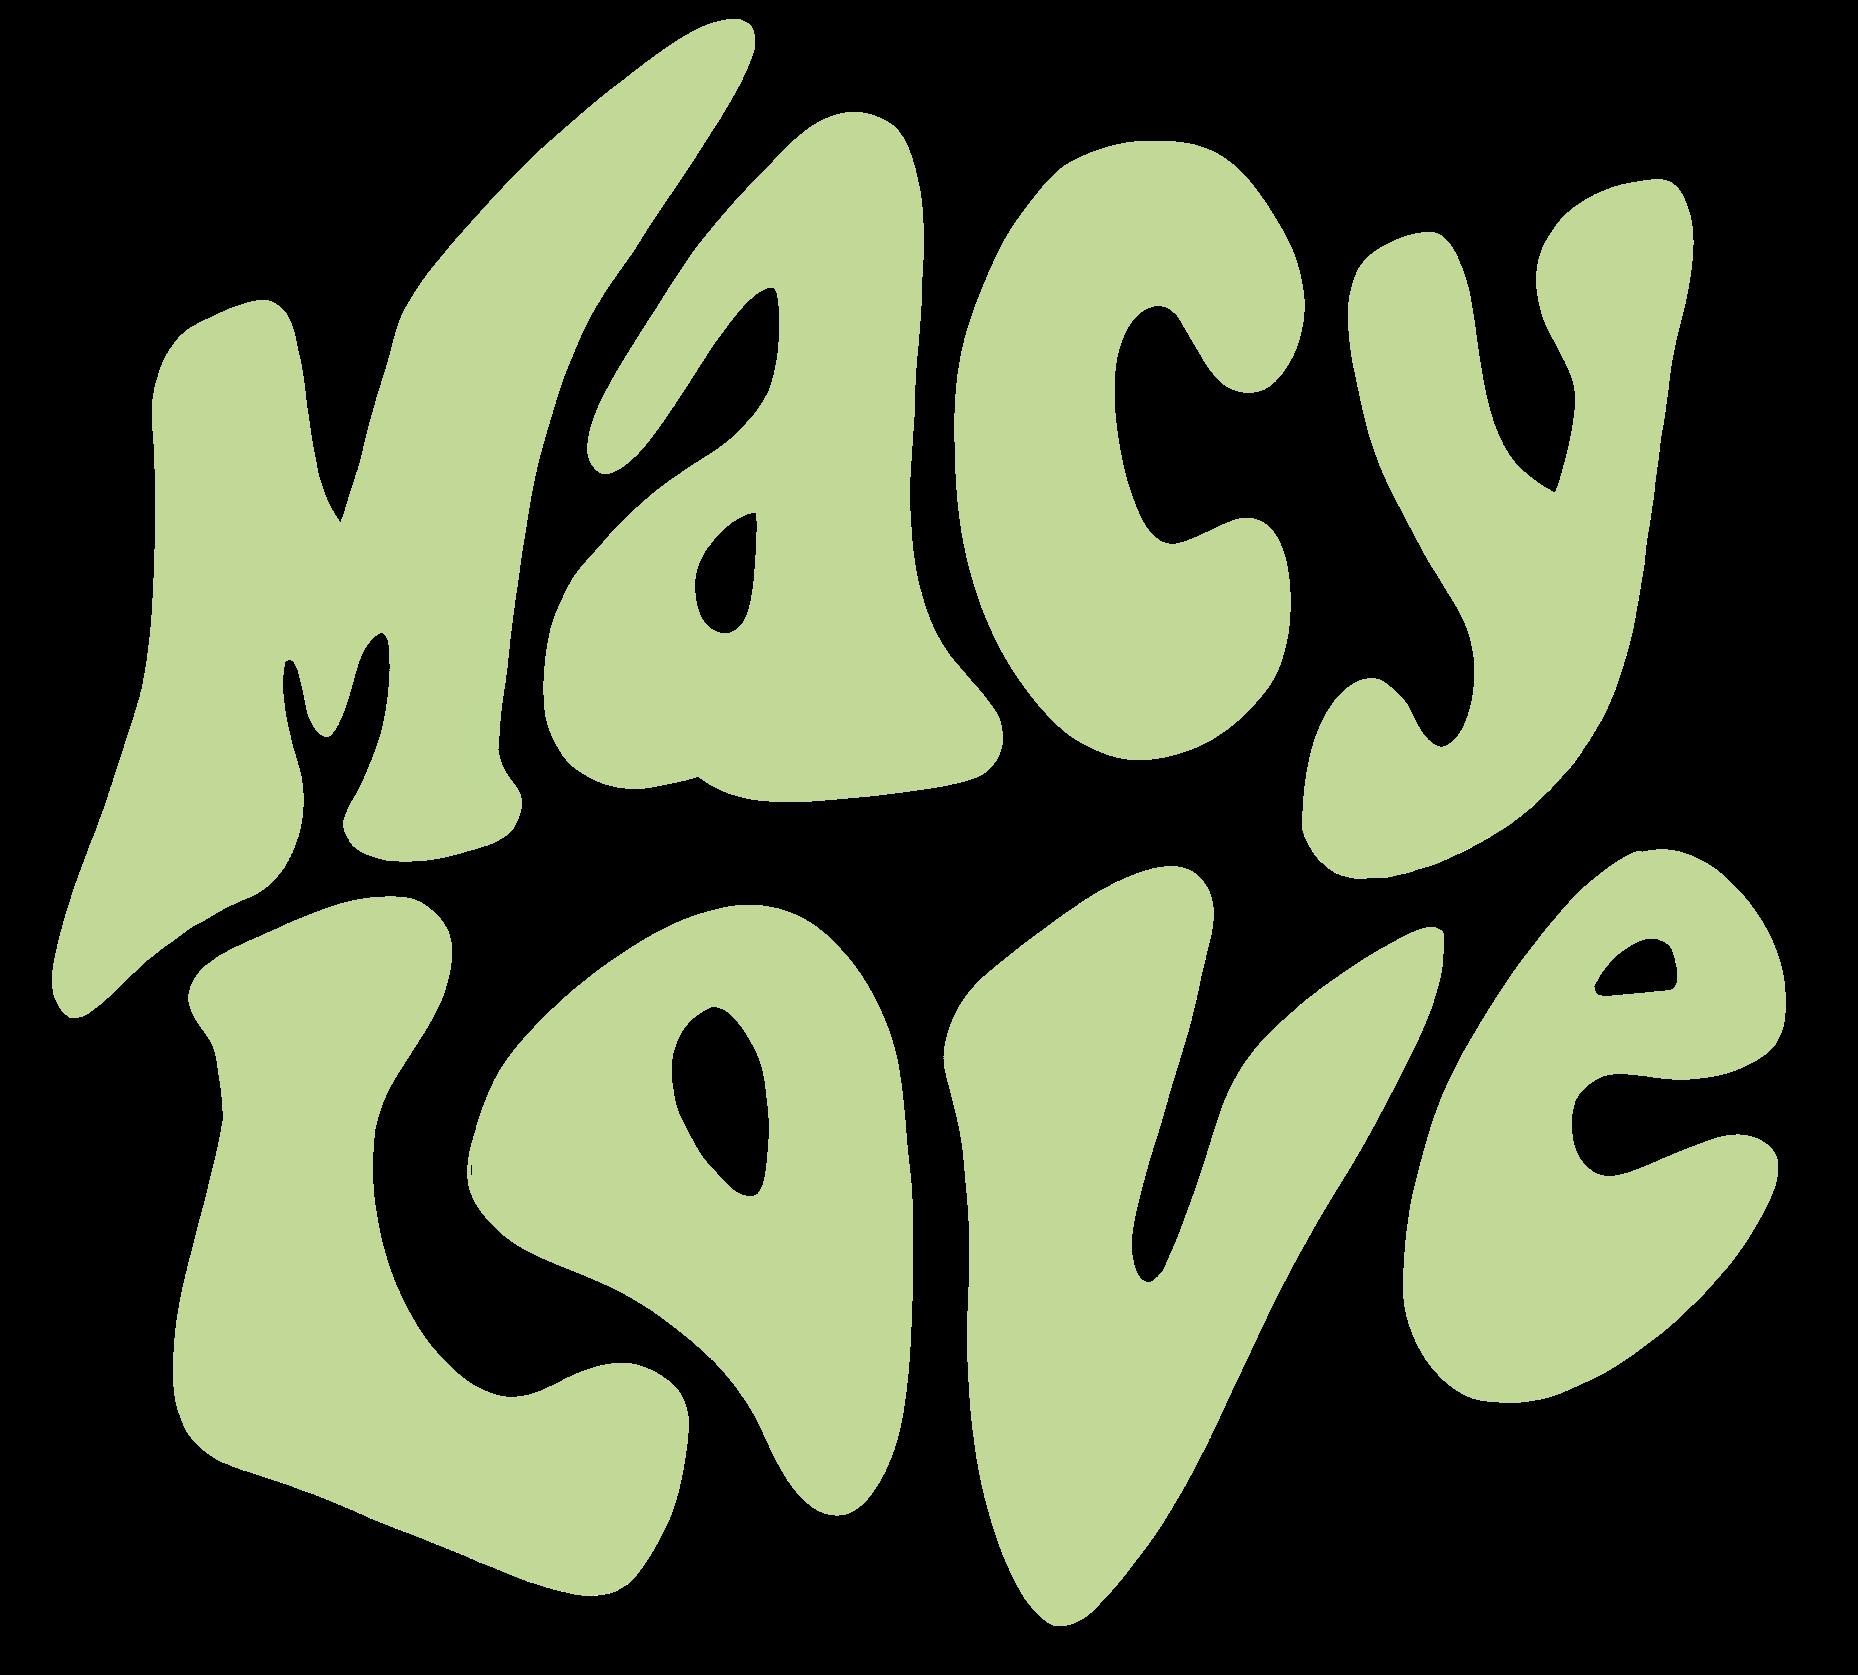 Macy Jayne Love